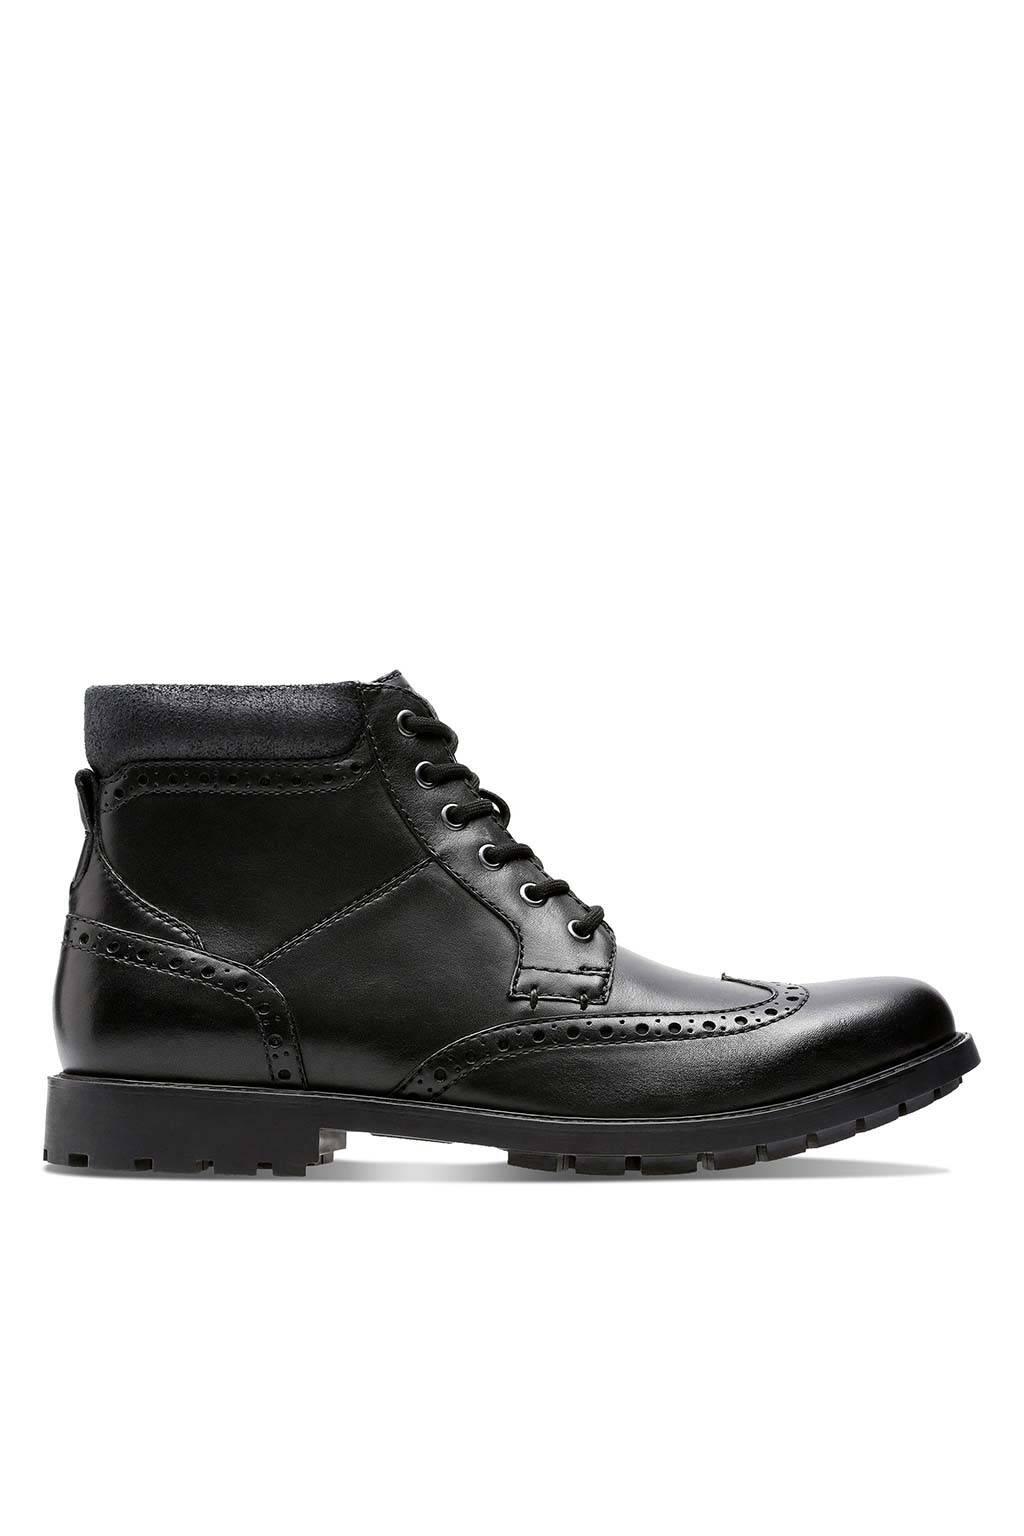 a36b9368532c Clarks Curington Rise Black Smooth leather - medinapiel.es